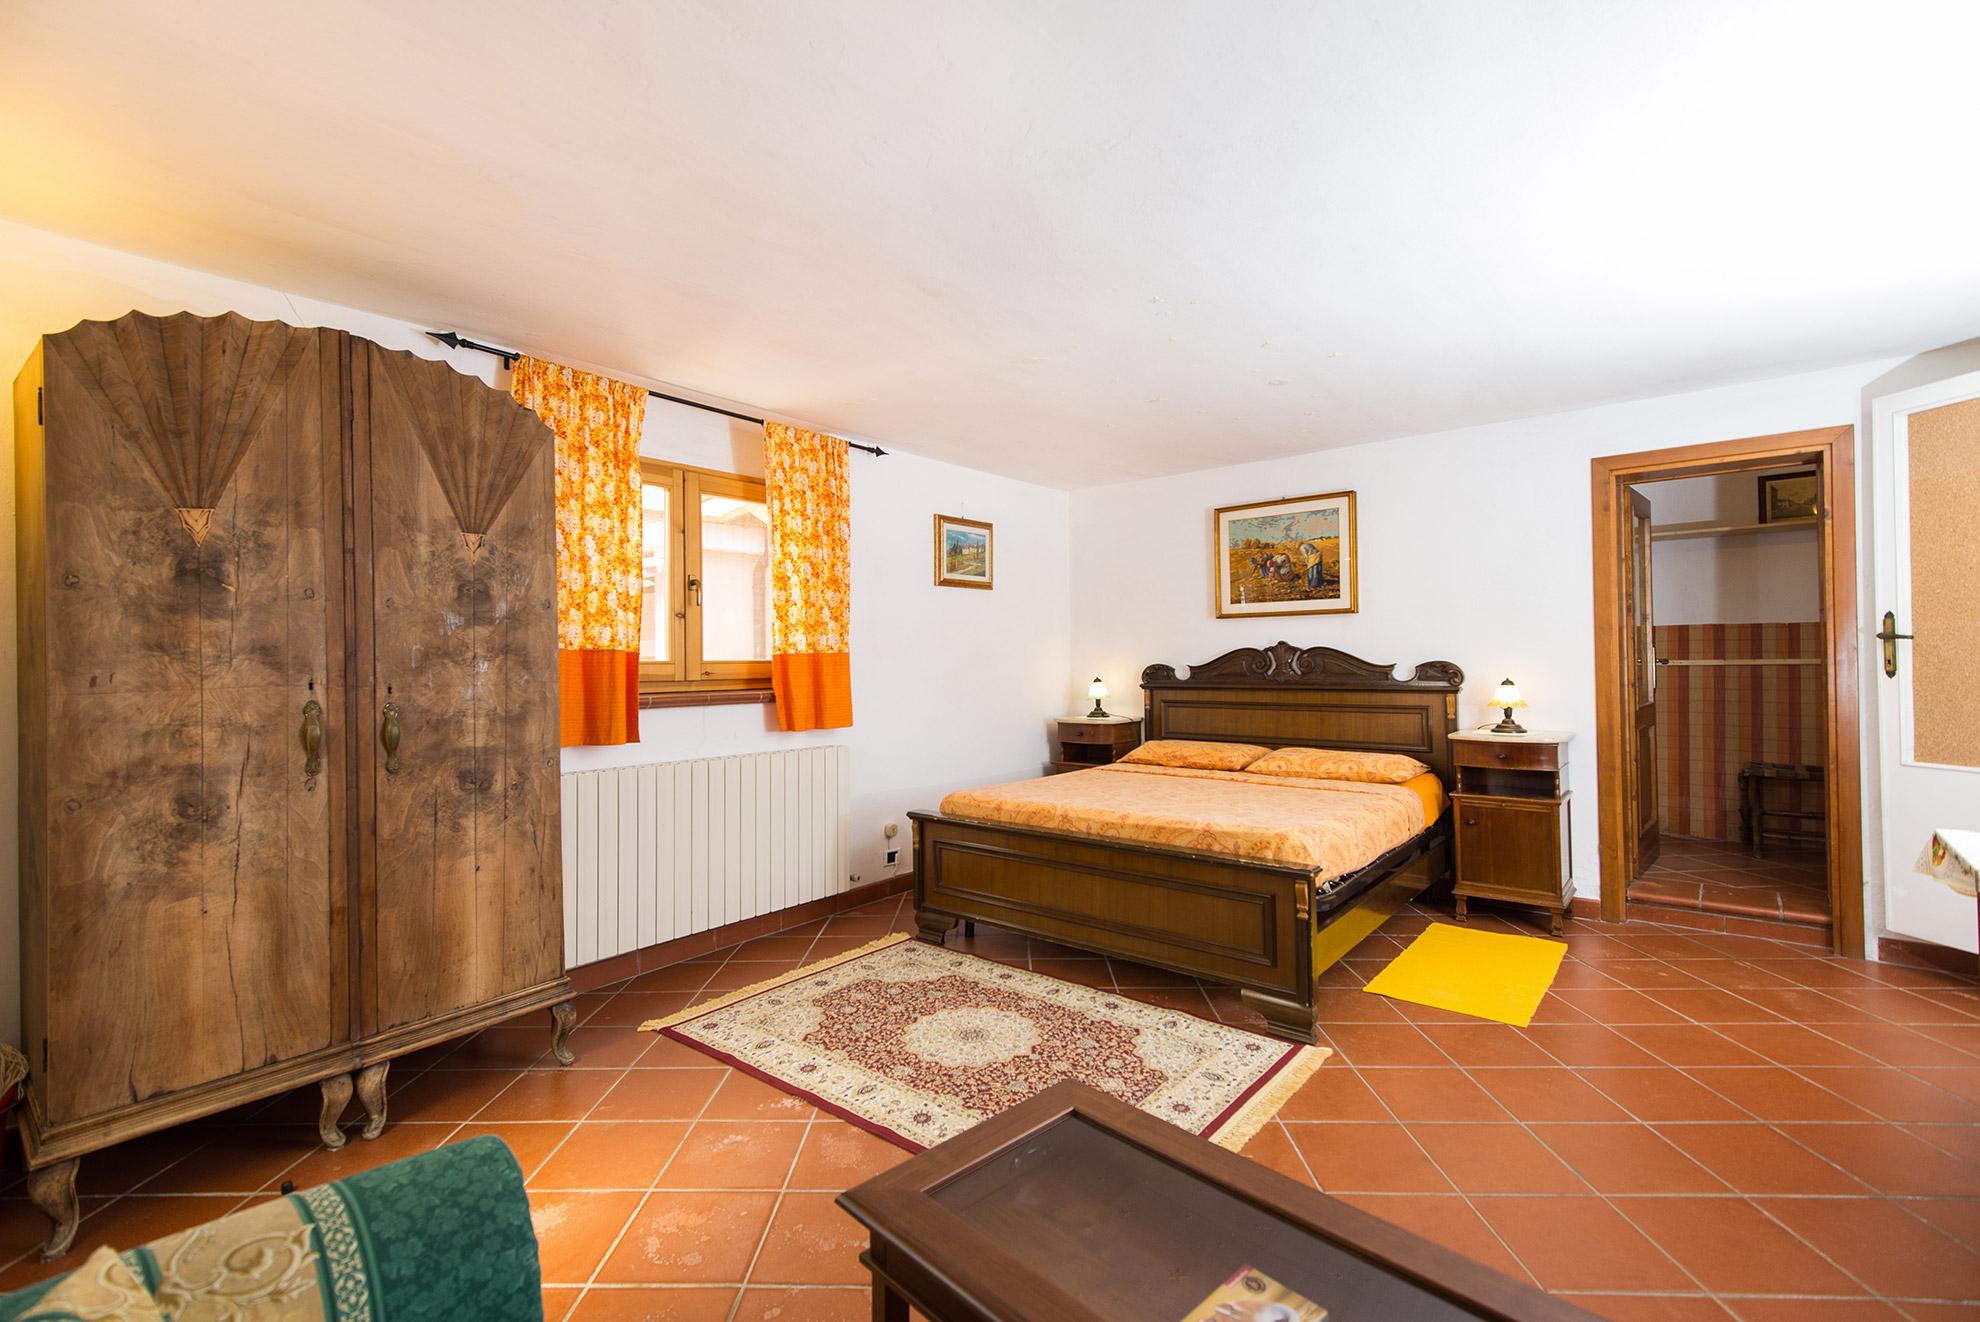 Ferienhaus Suvereto Casetta Piccola 3